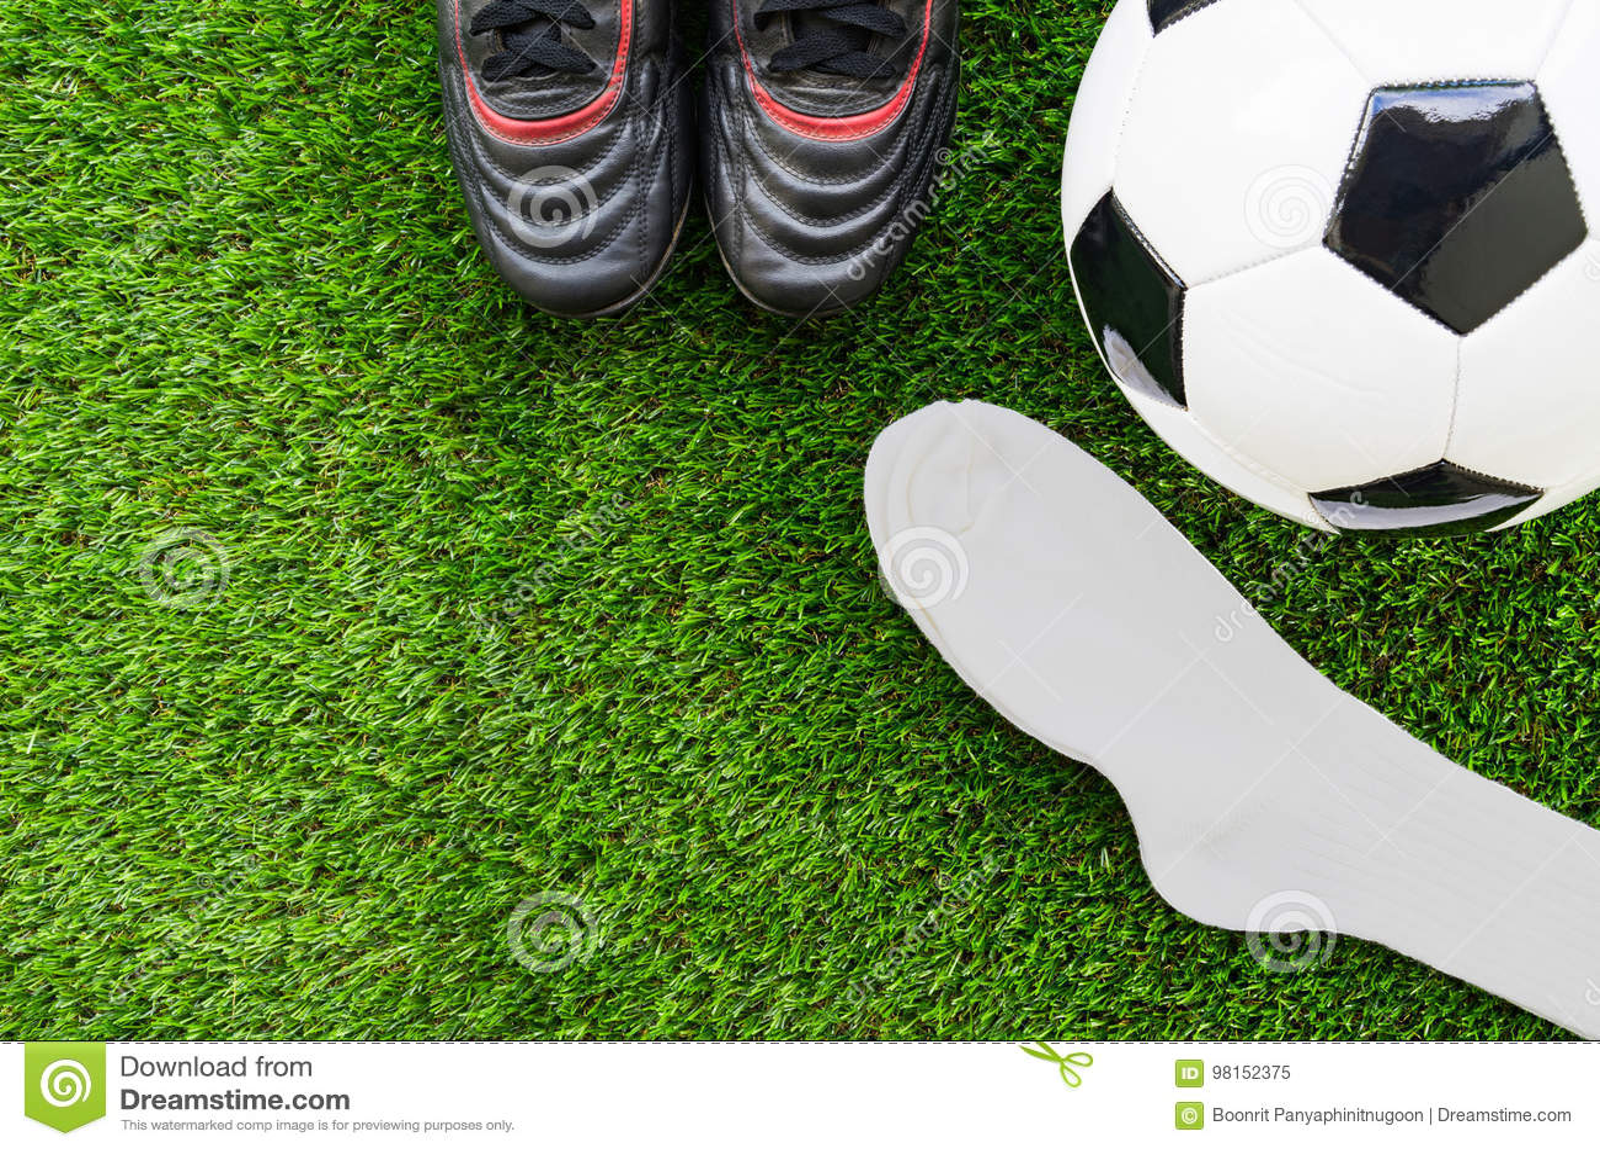 b216e071c32 Soccer Concept   Football   X28 soccer Ball  X29